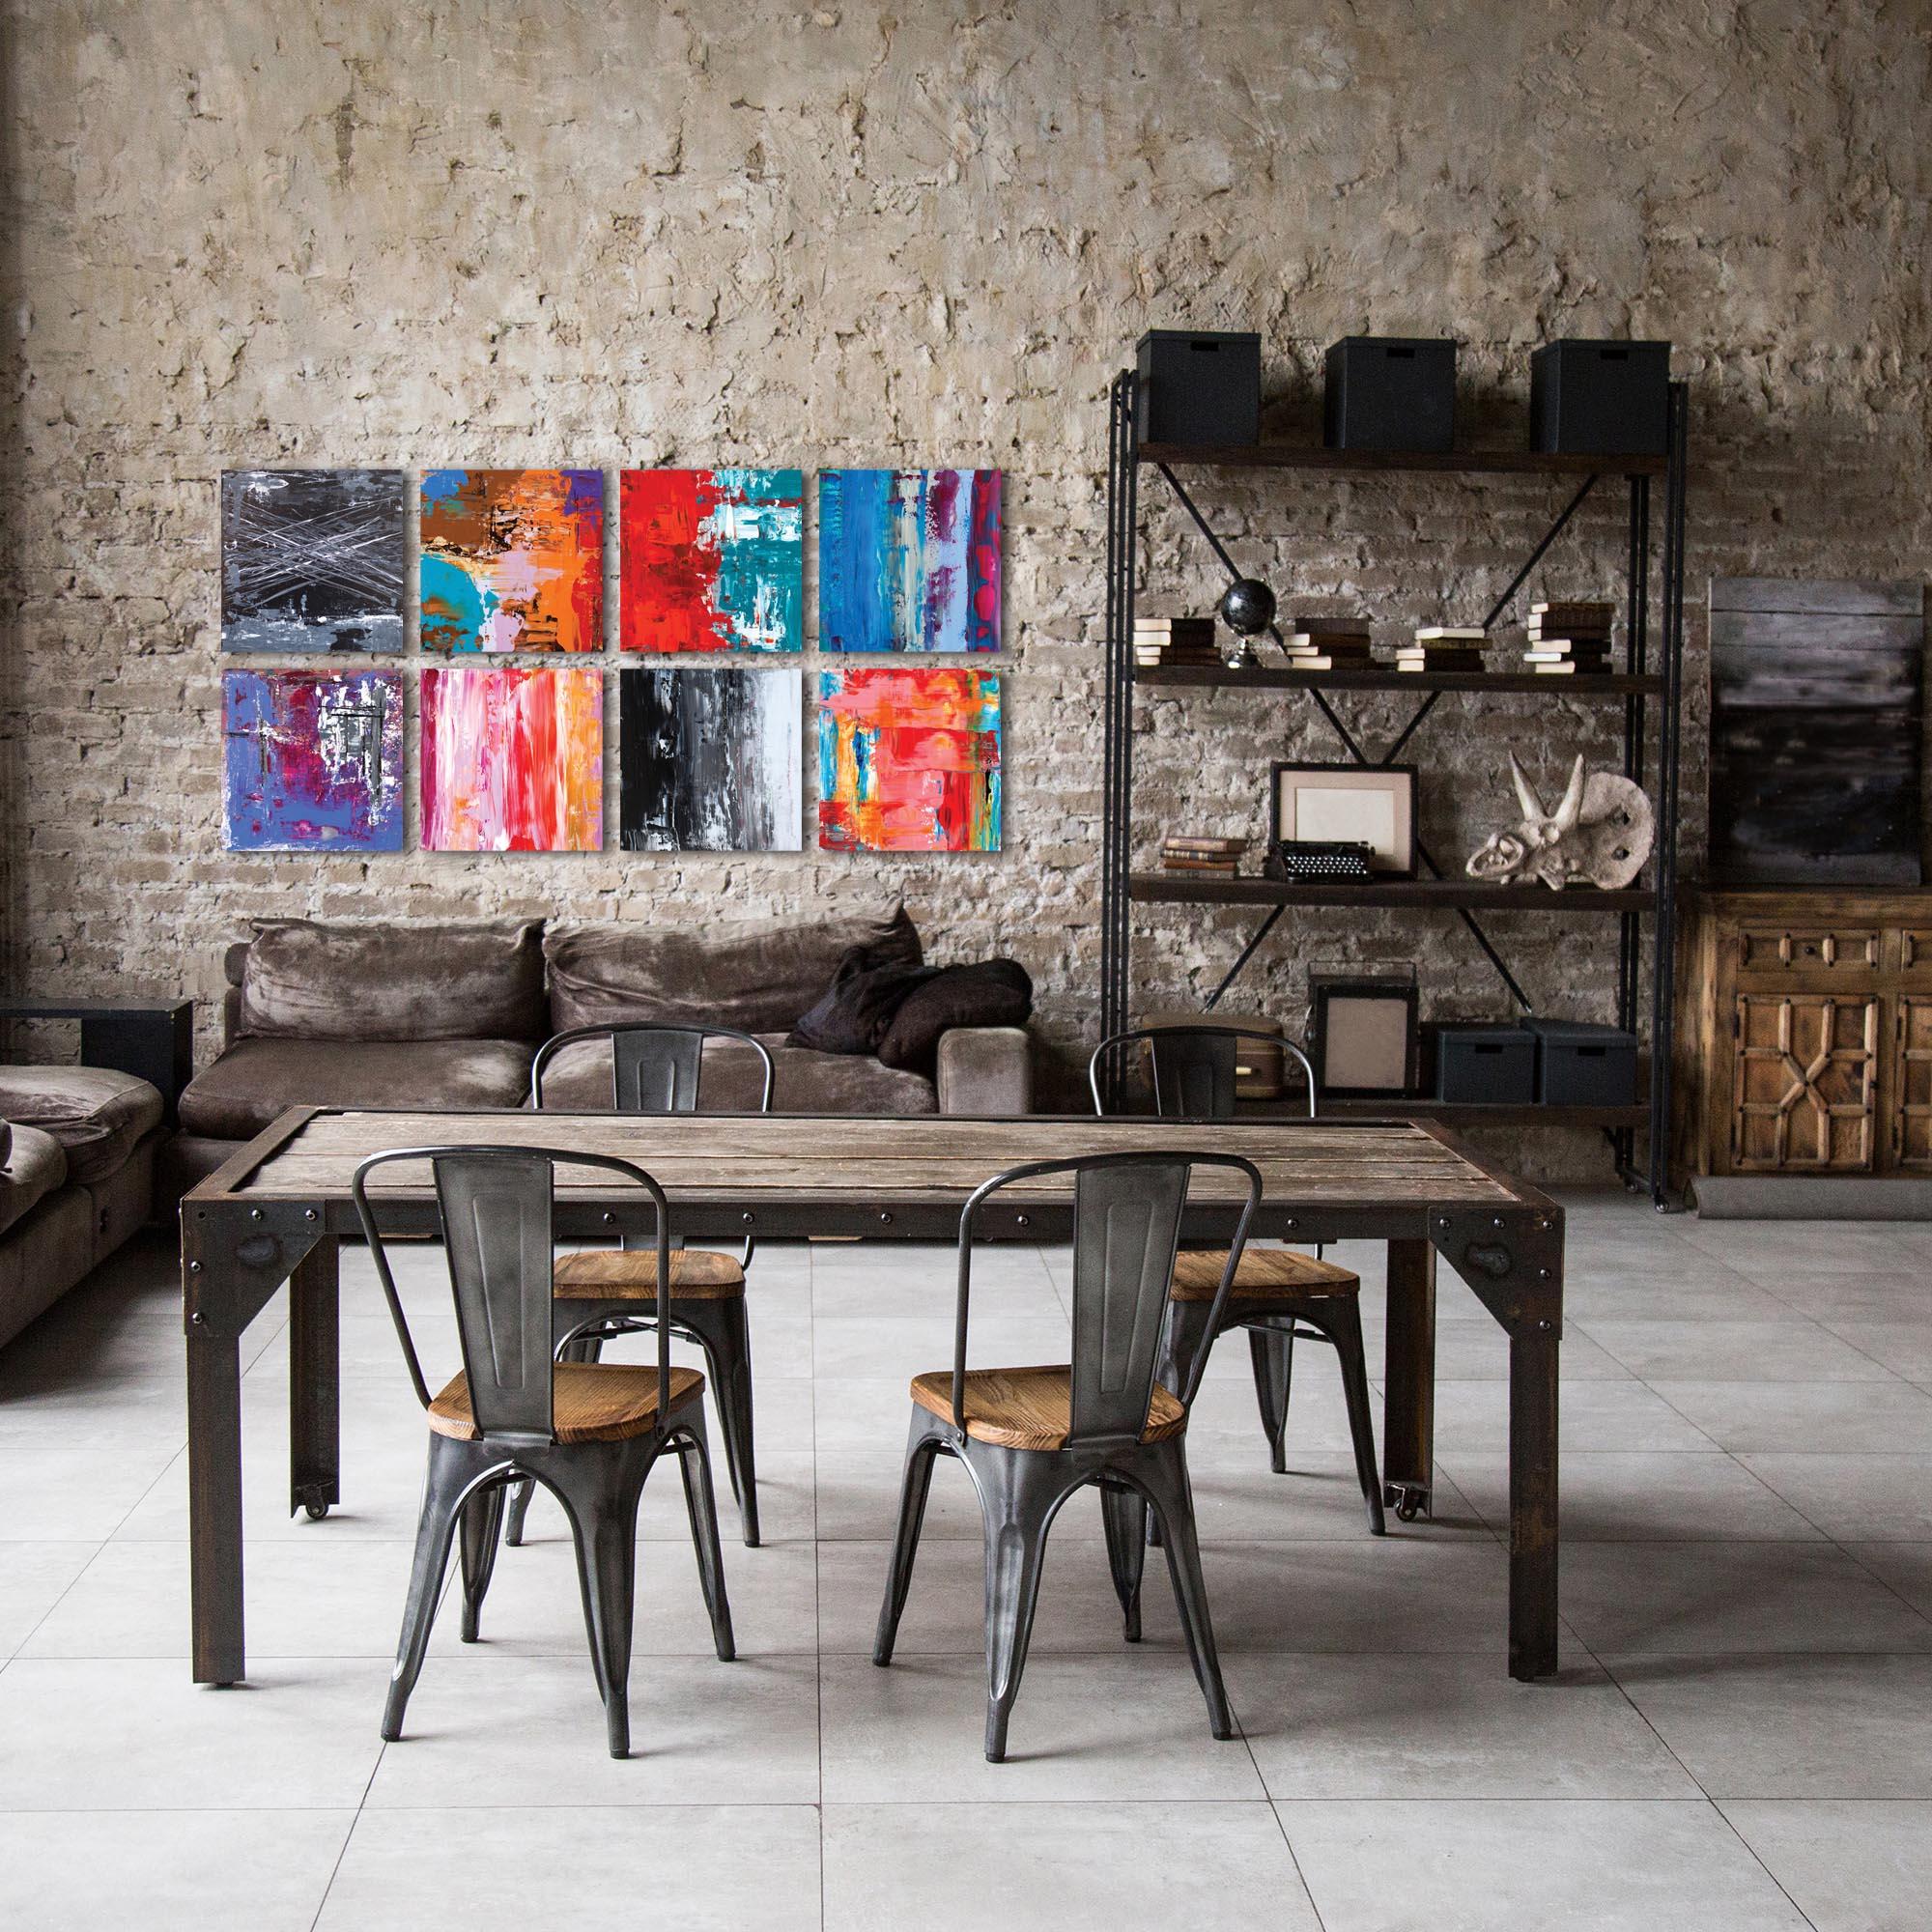 Abstract Wall Art 'Urban Windows Large' - Urban Decor on Metal or Plexiglass - Lifestyle View